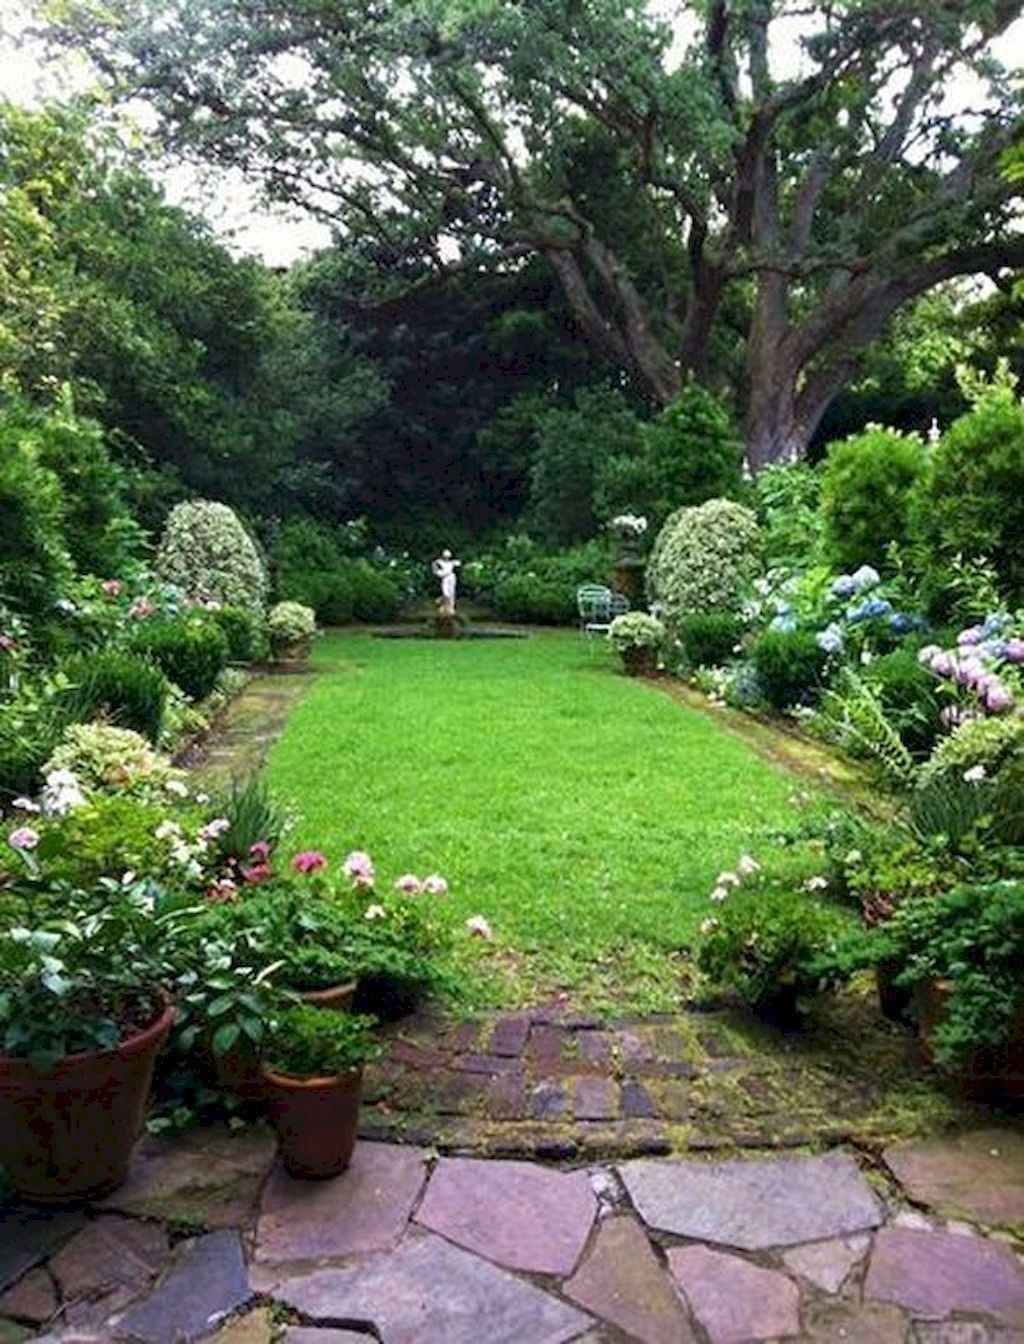 5c35e20a5491b51843fe755c070b2e72 - Garden Designs For Small Gardens Picture